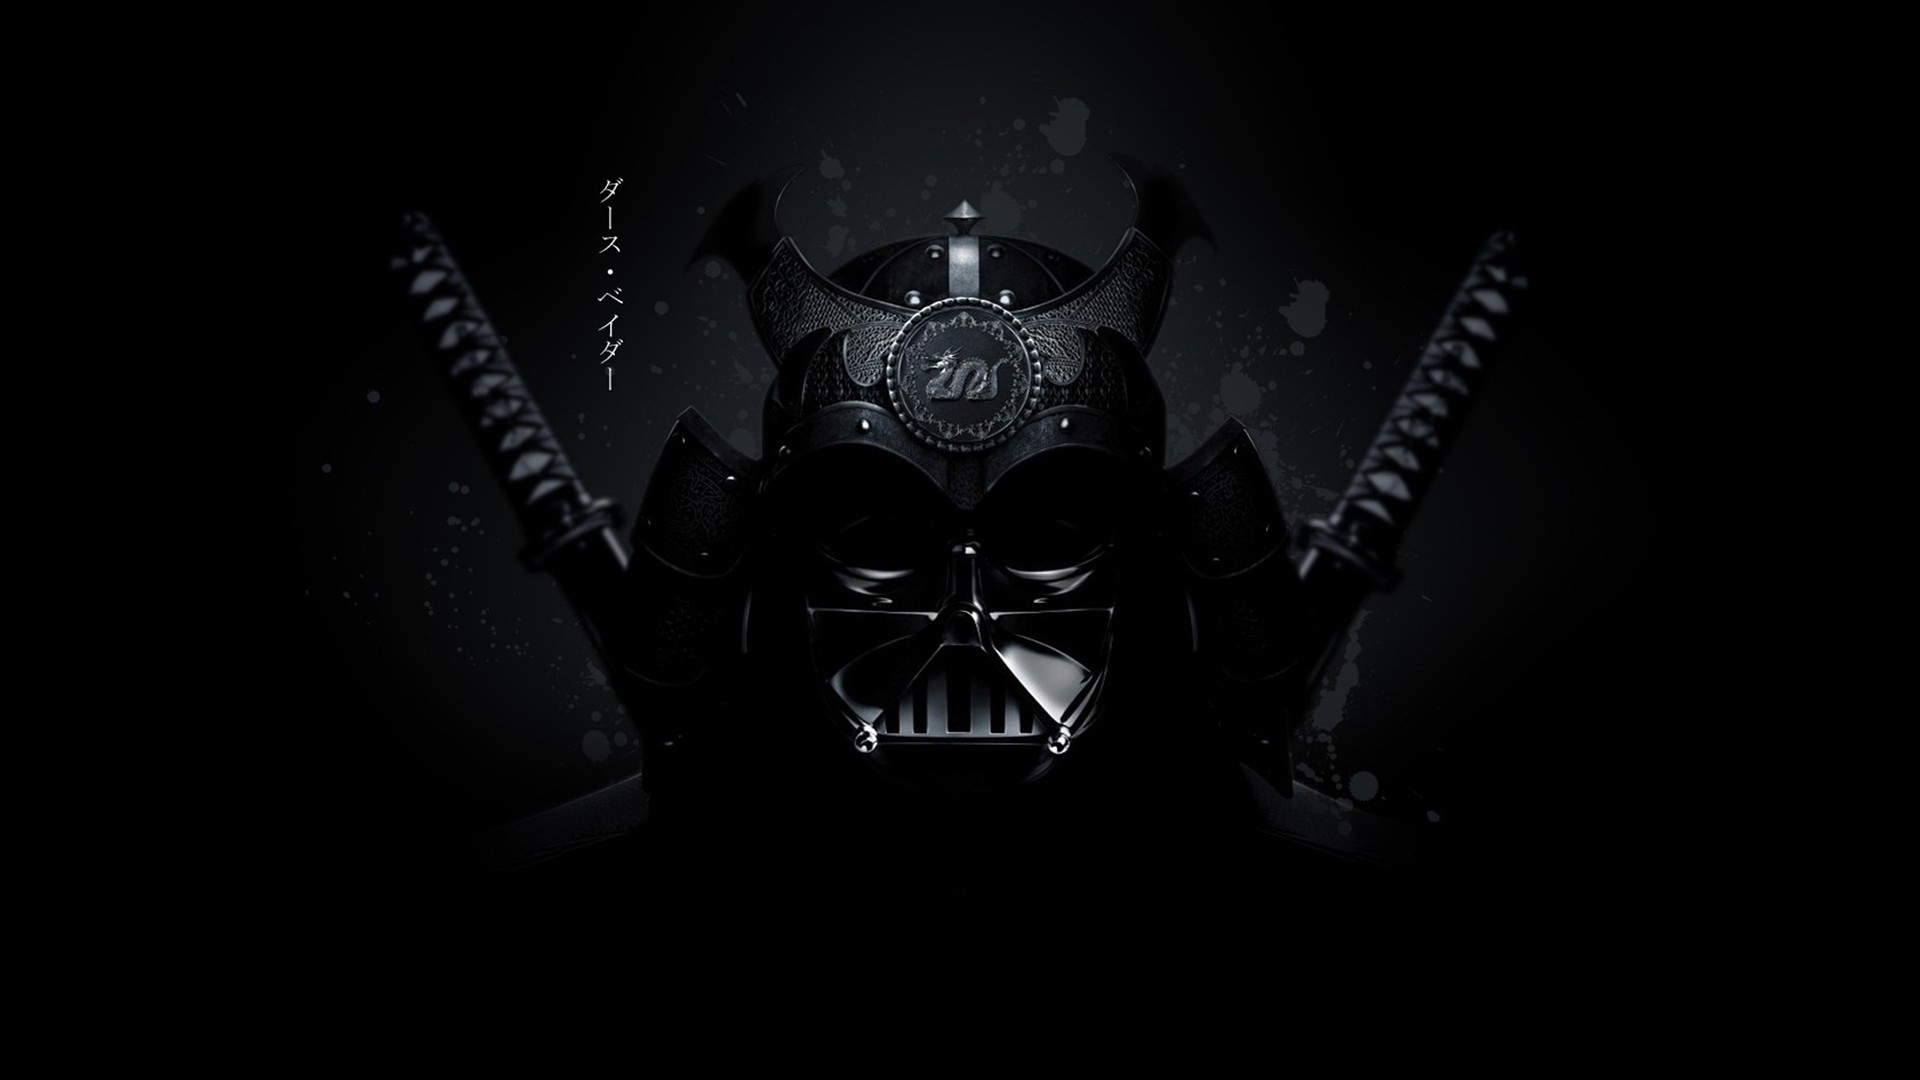 Star Wars wallpaper dump – Imgur